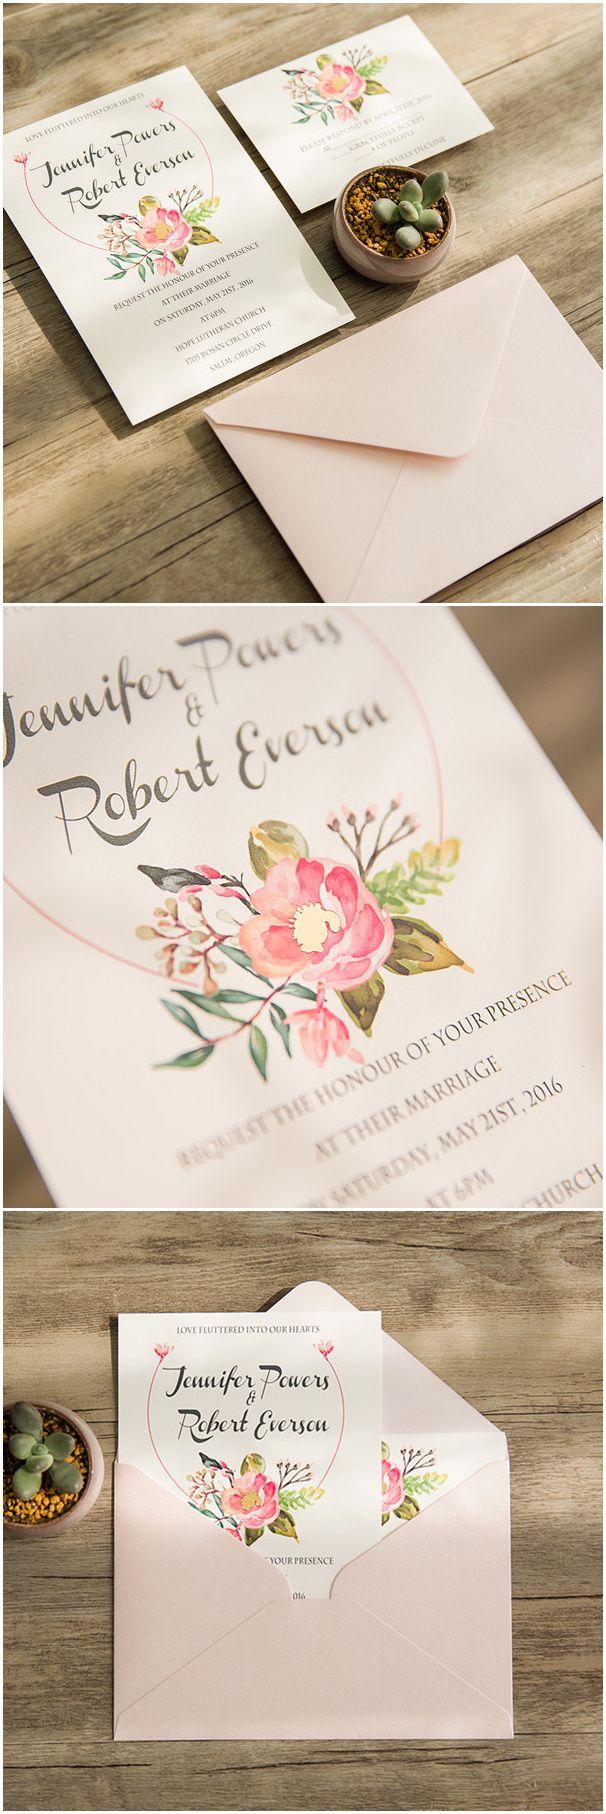 Pinterest Wedding Invitations Tagline For Wedding Invitation Free Invitation Templates